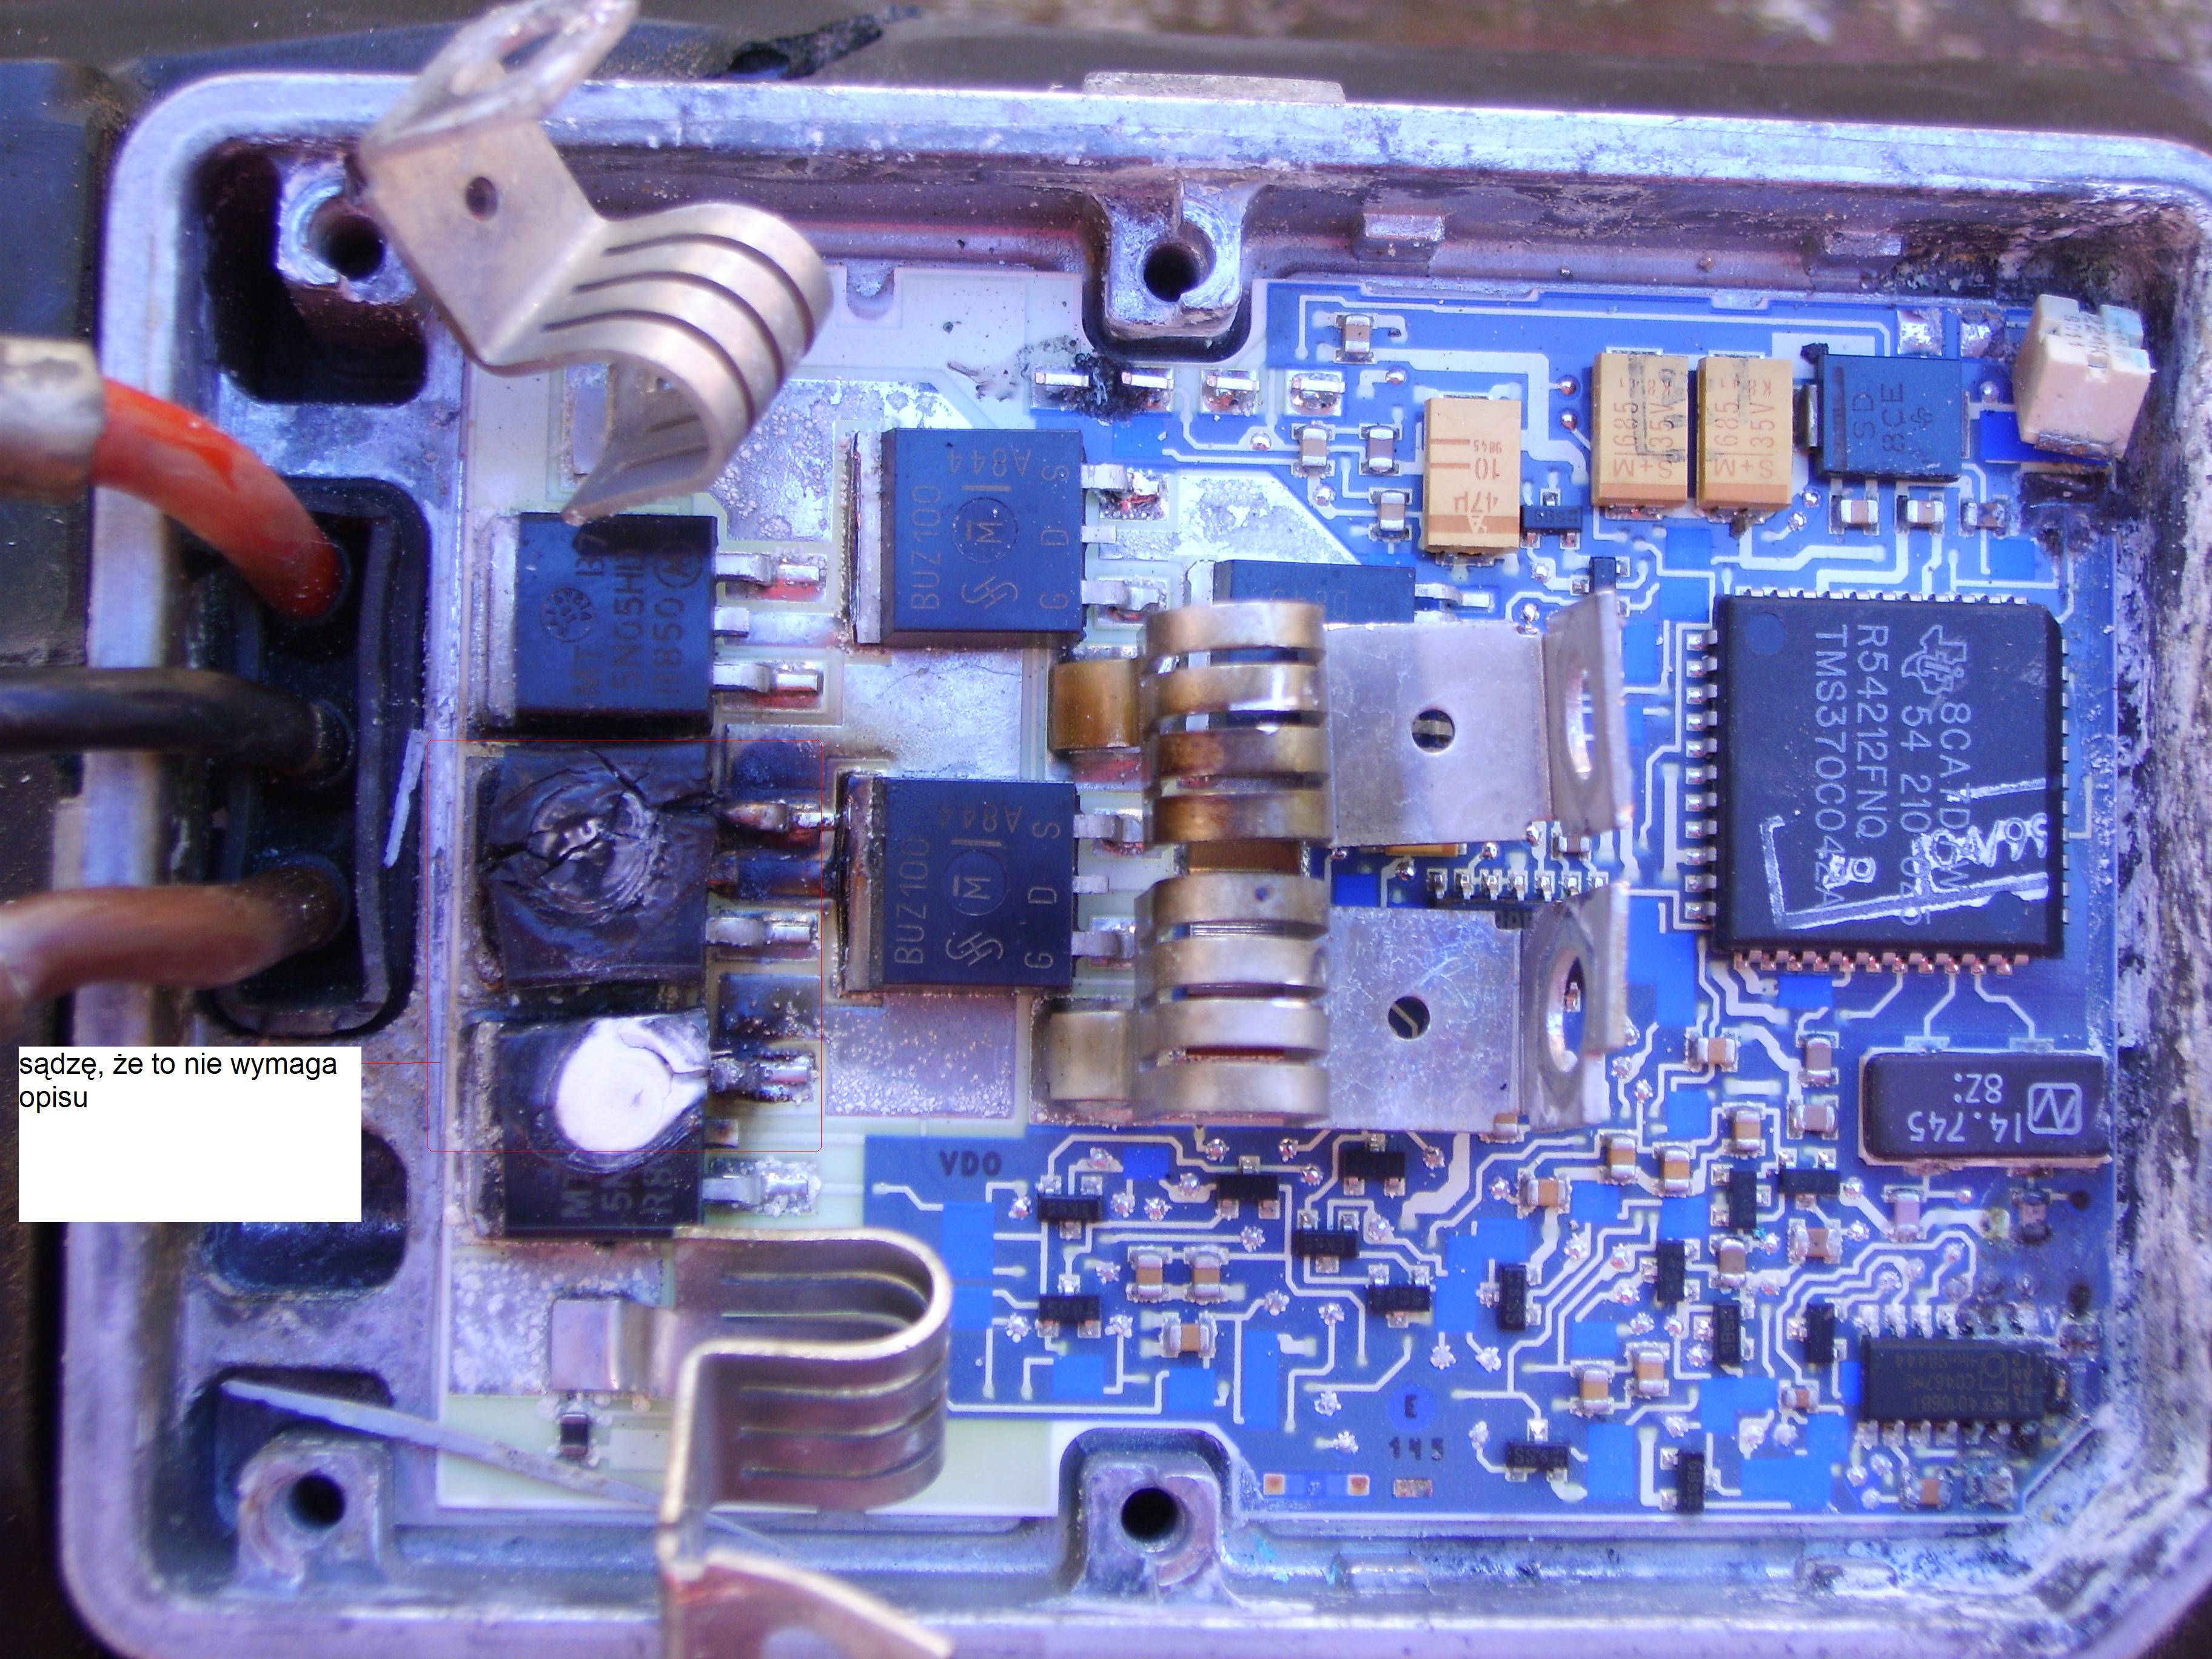 W superbly Pompa wspomagania merceses A klasa - elektroda.pl TK51